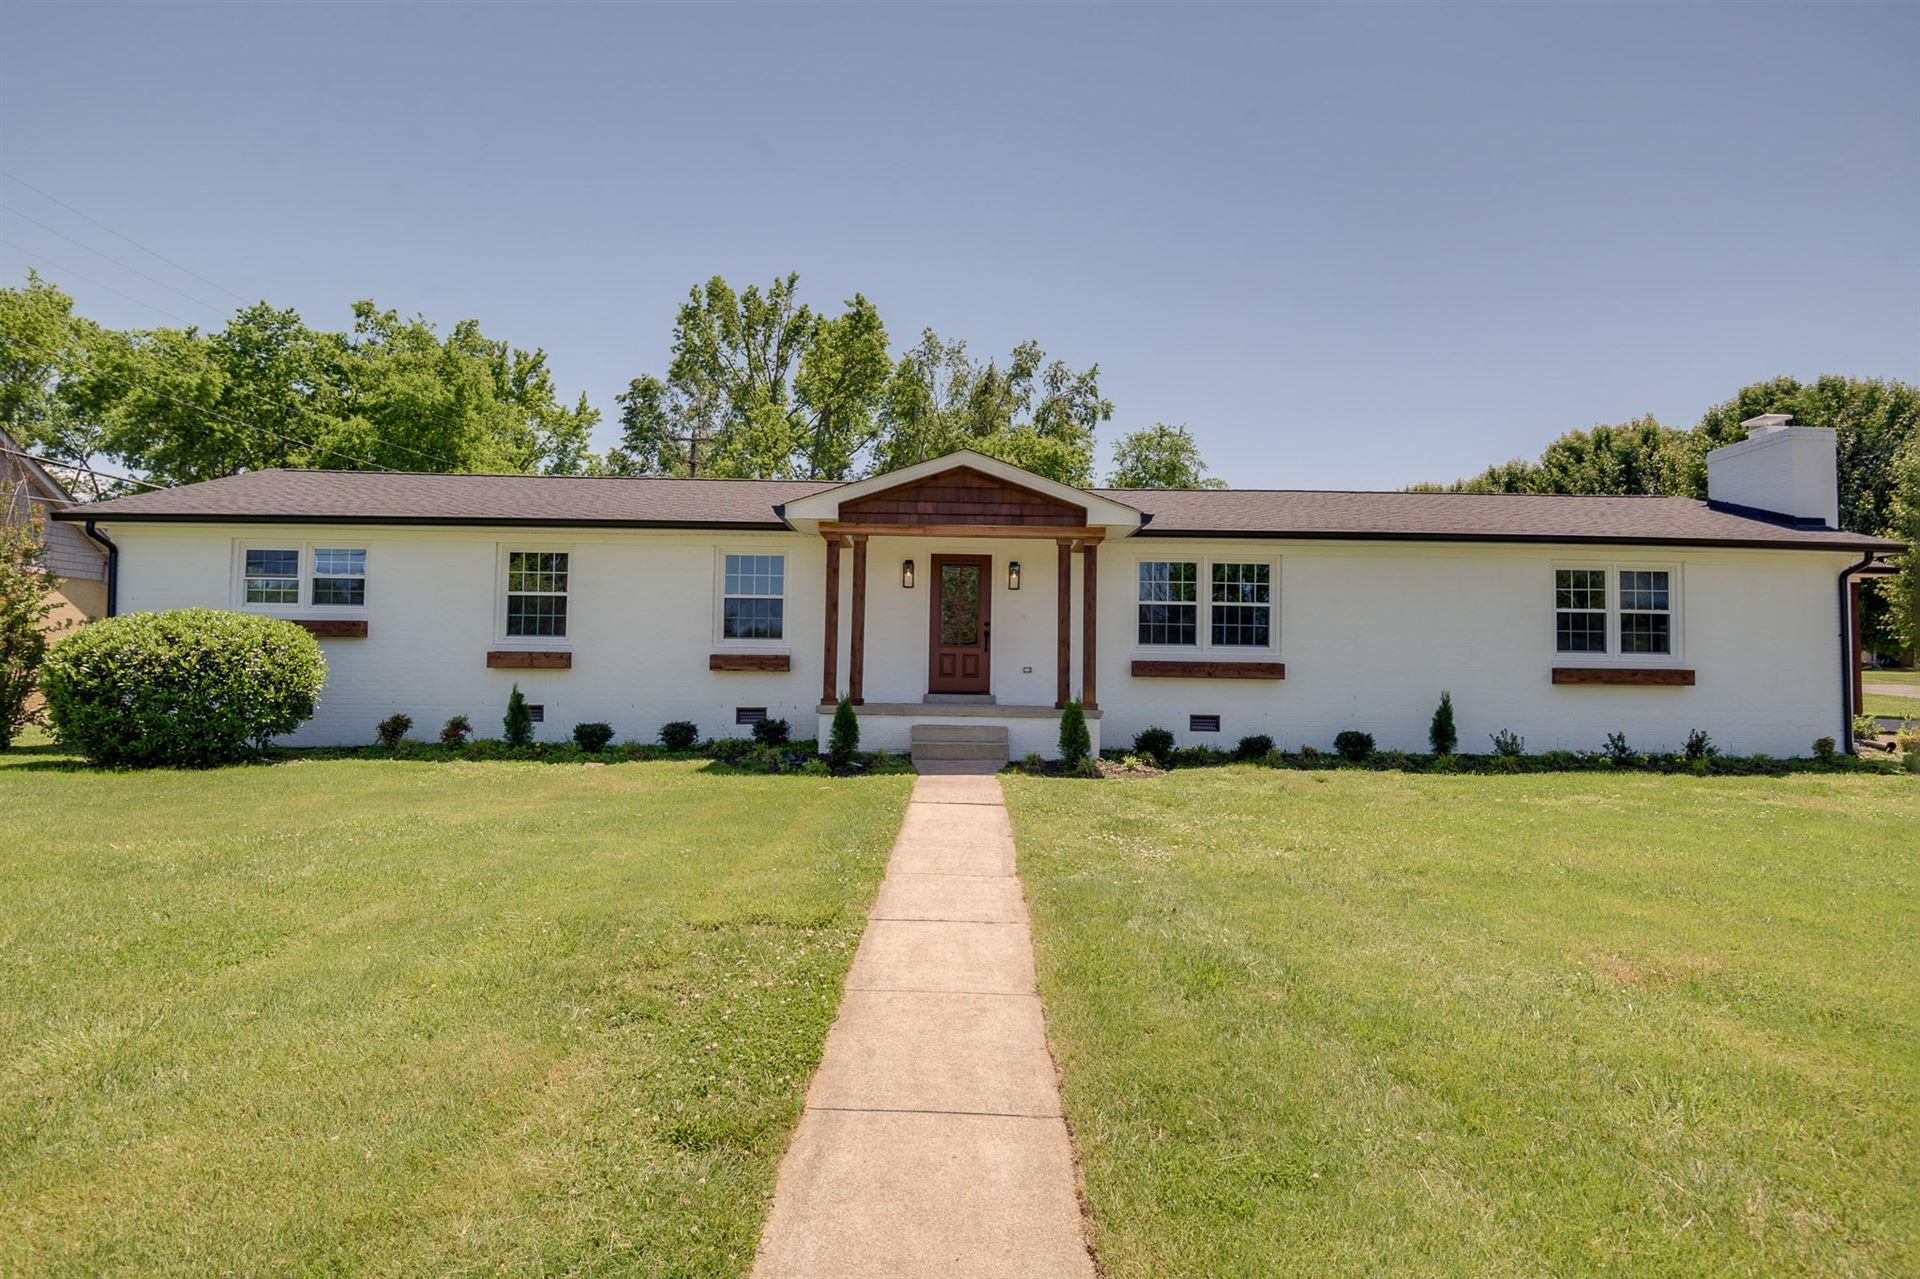 307 Cloverdale, Shelbyville, TN 37160 - MLS#: 2253277